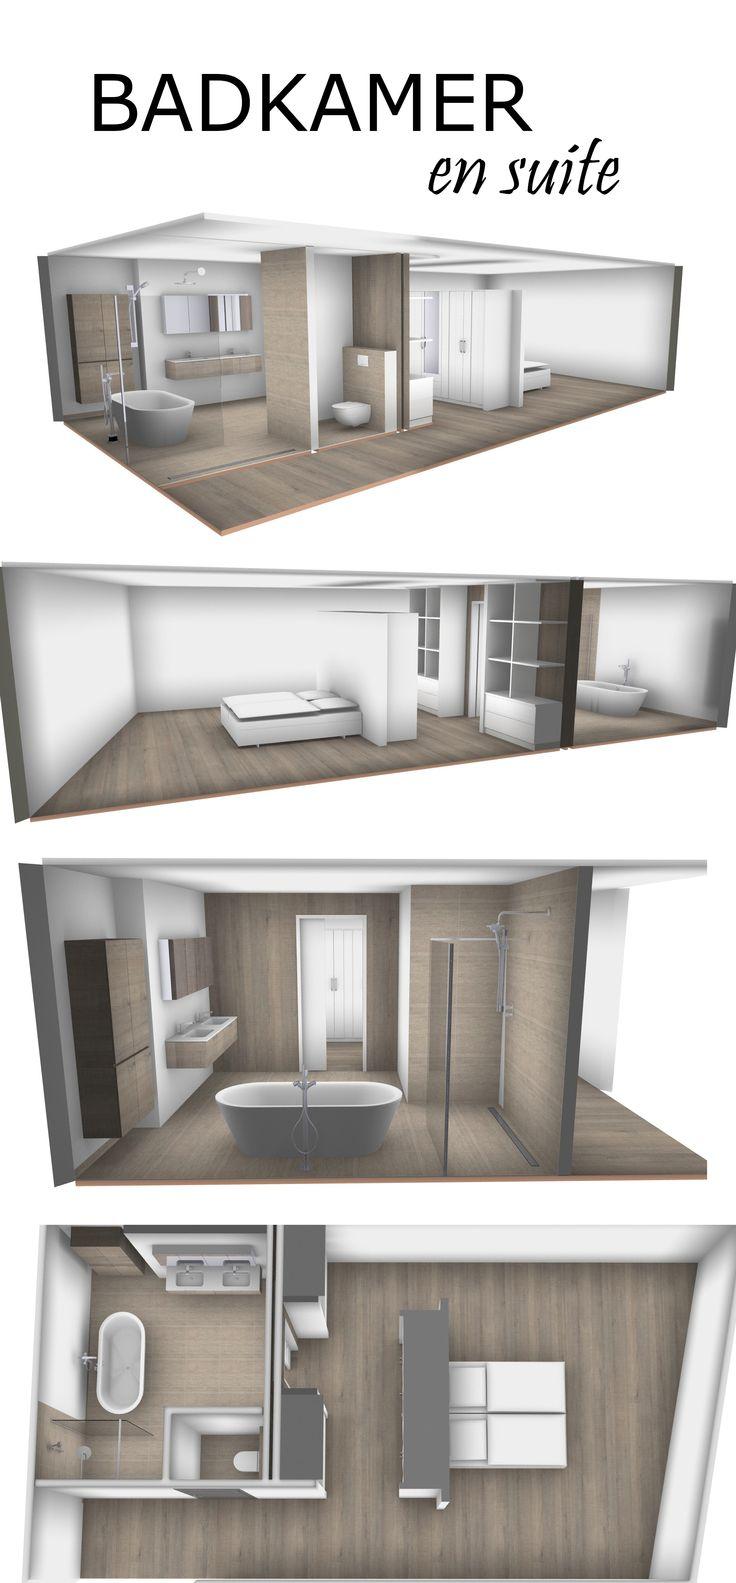 61 best images about 3d badkamer ontwerpen on pinterest - Keuken ontwerpen ...